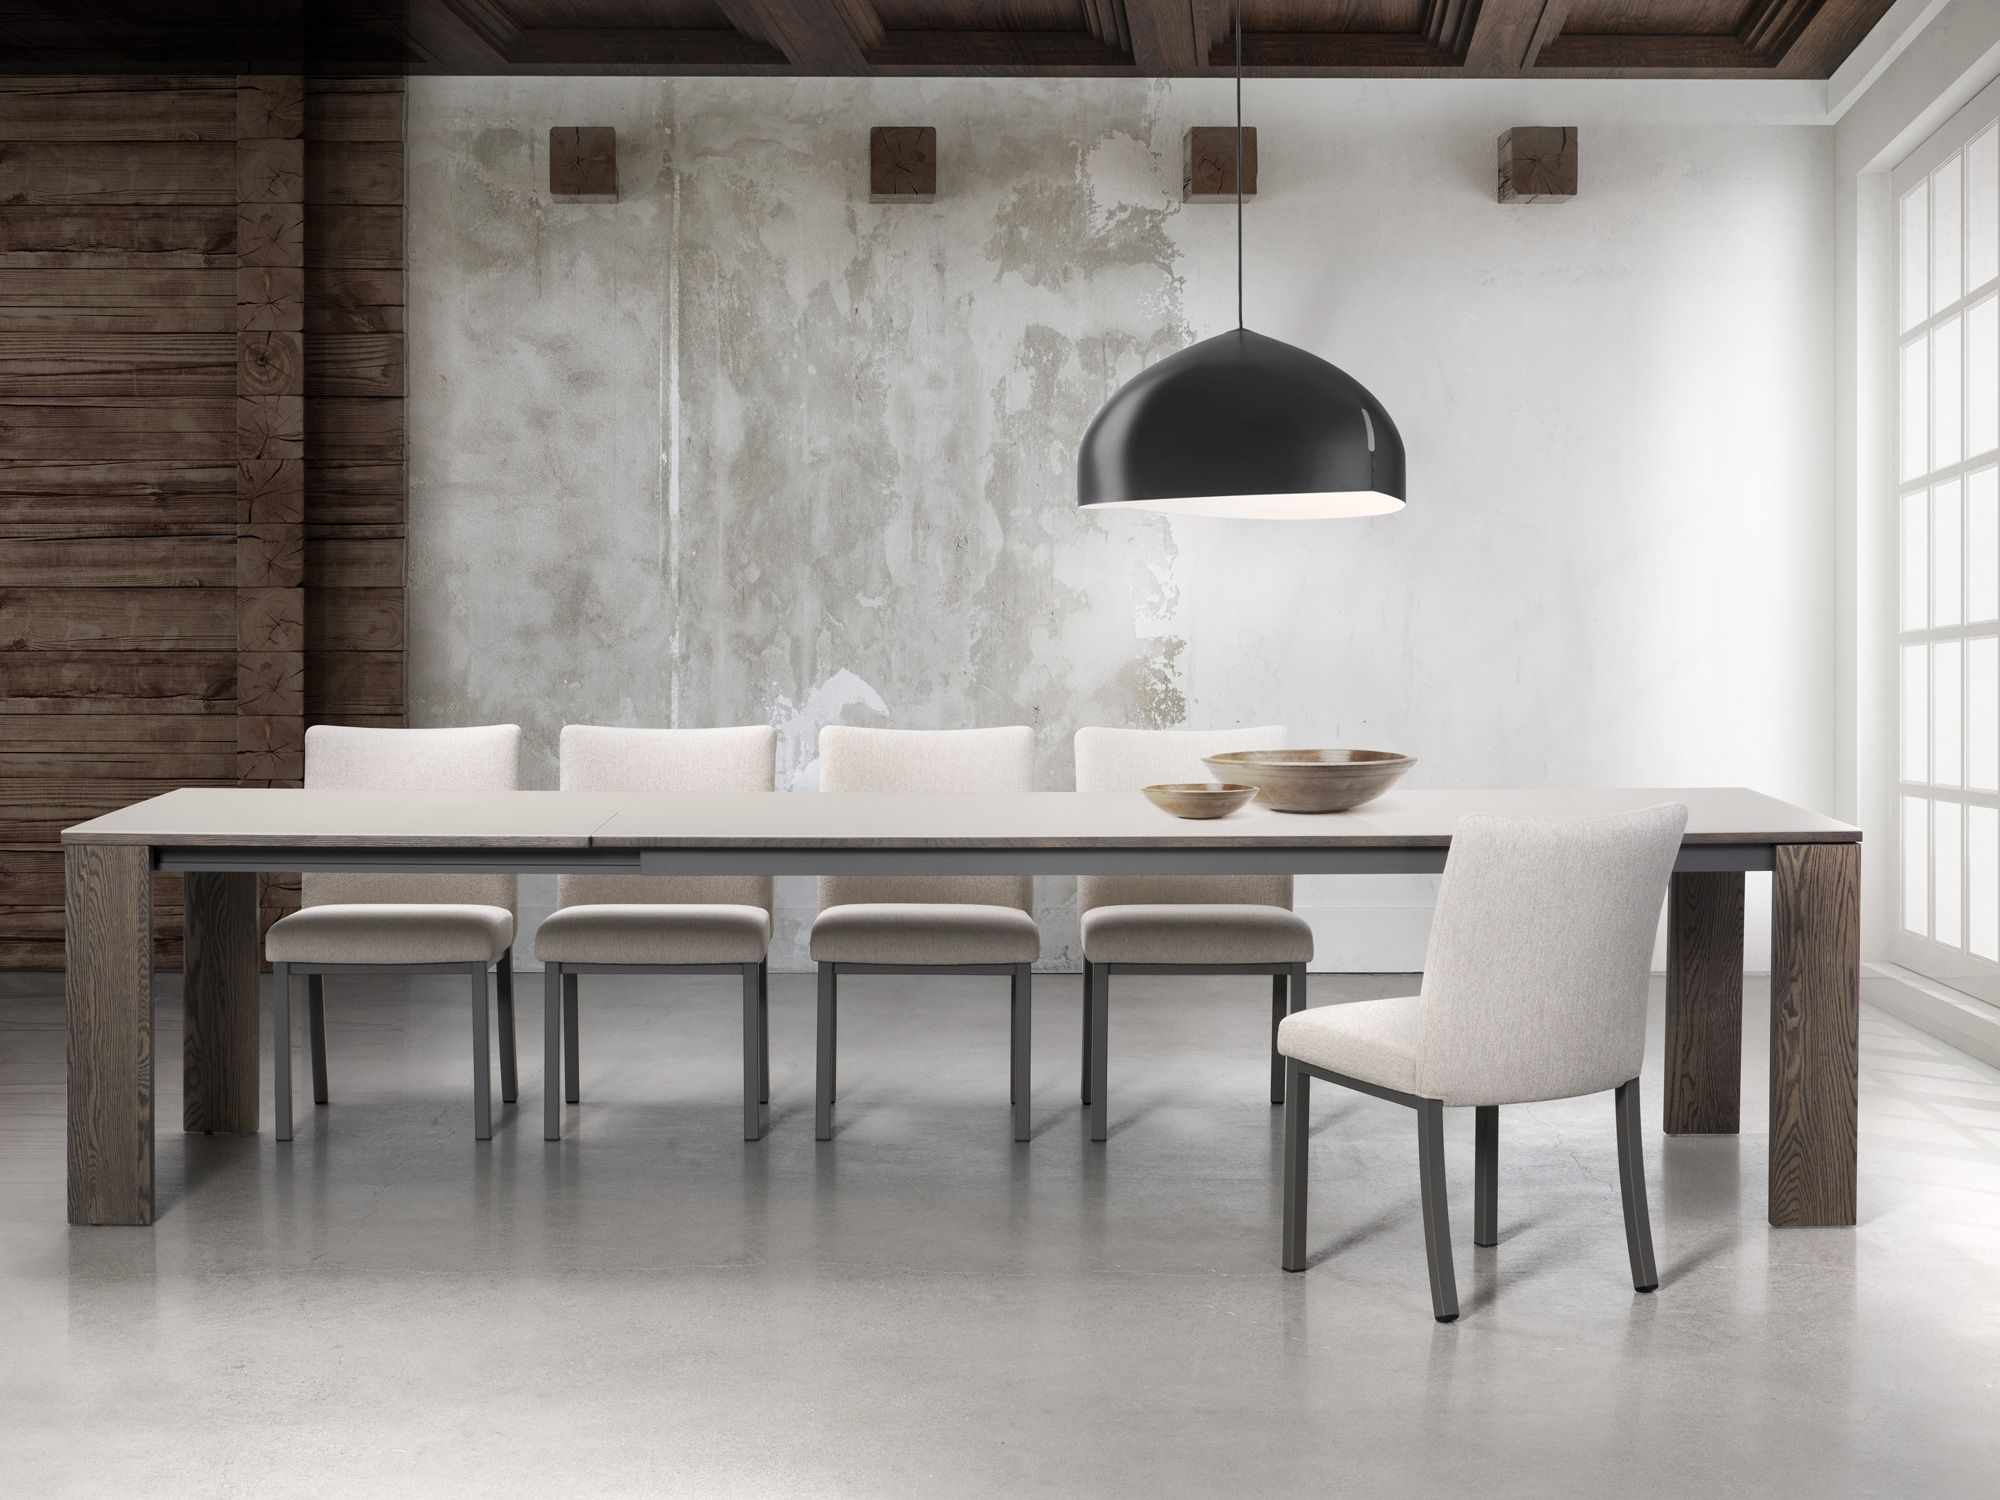 Trica empire dining table extension homedecor interiordesign contemporaryfurniture homedesign